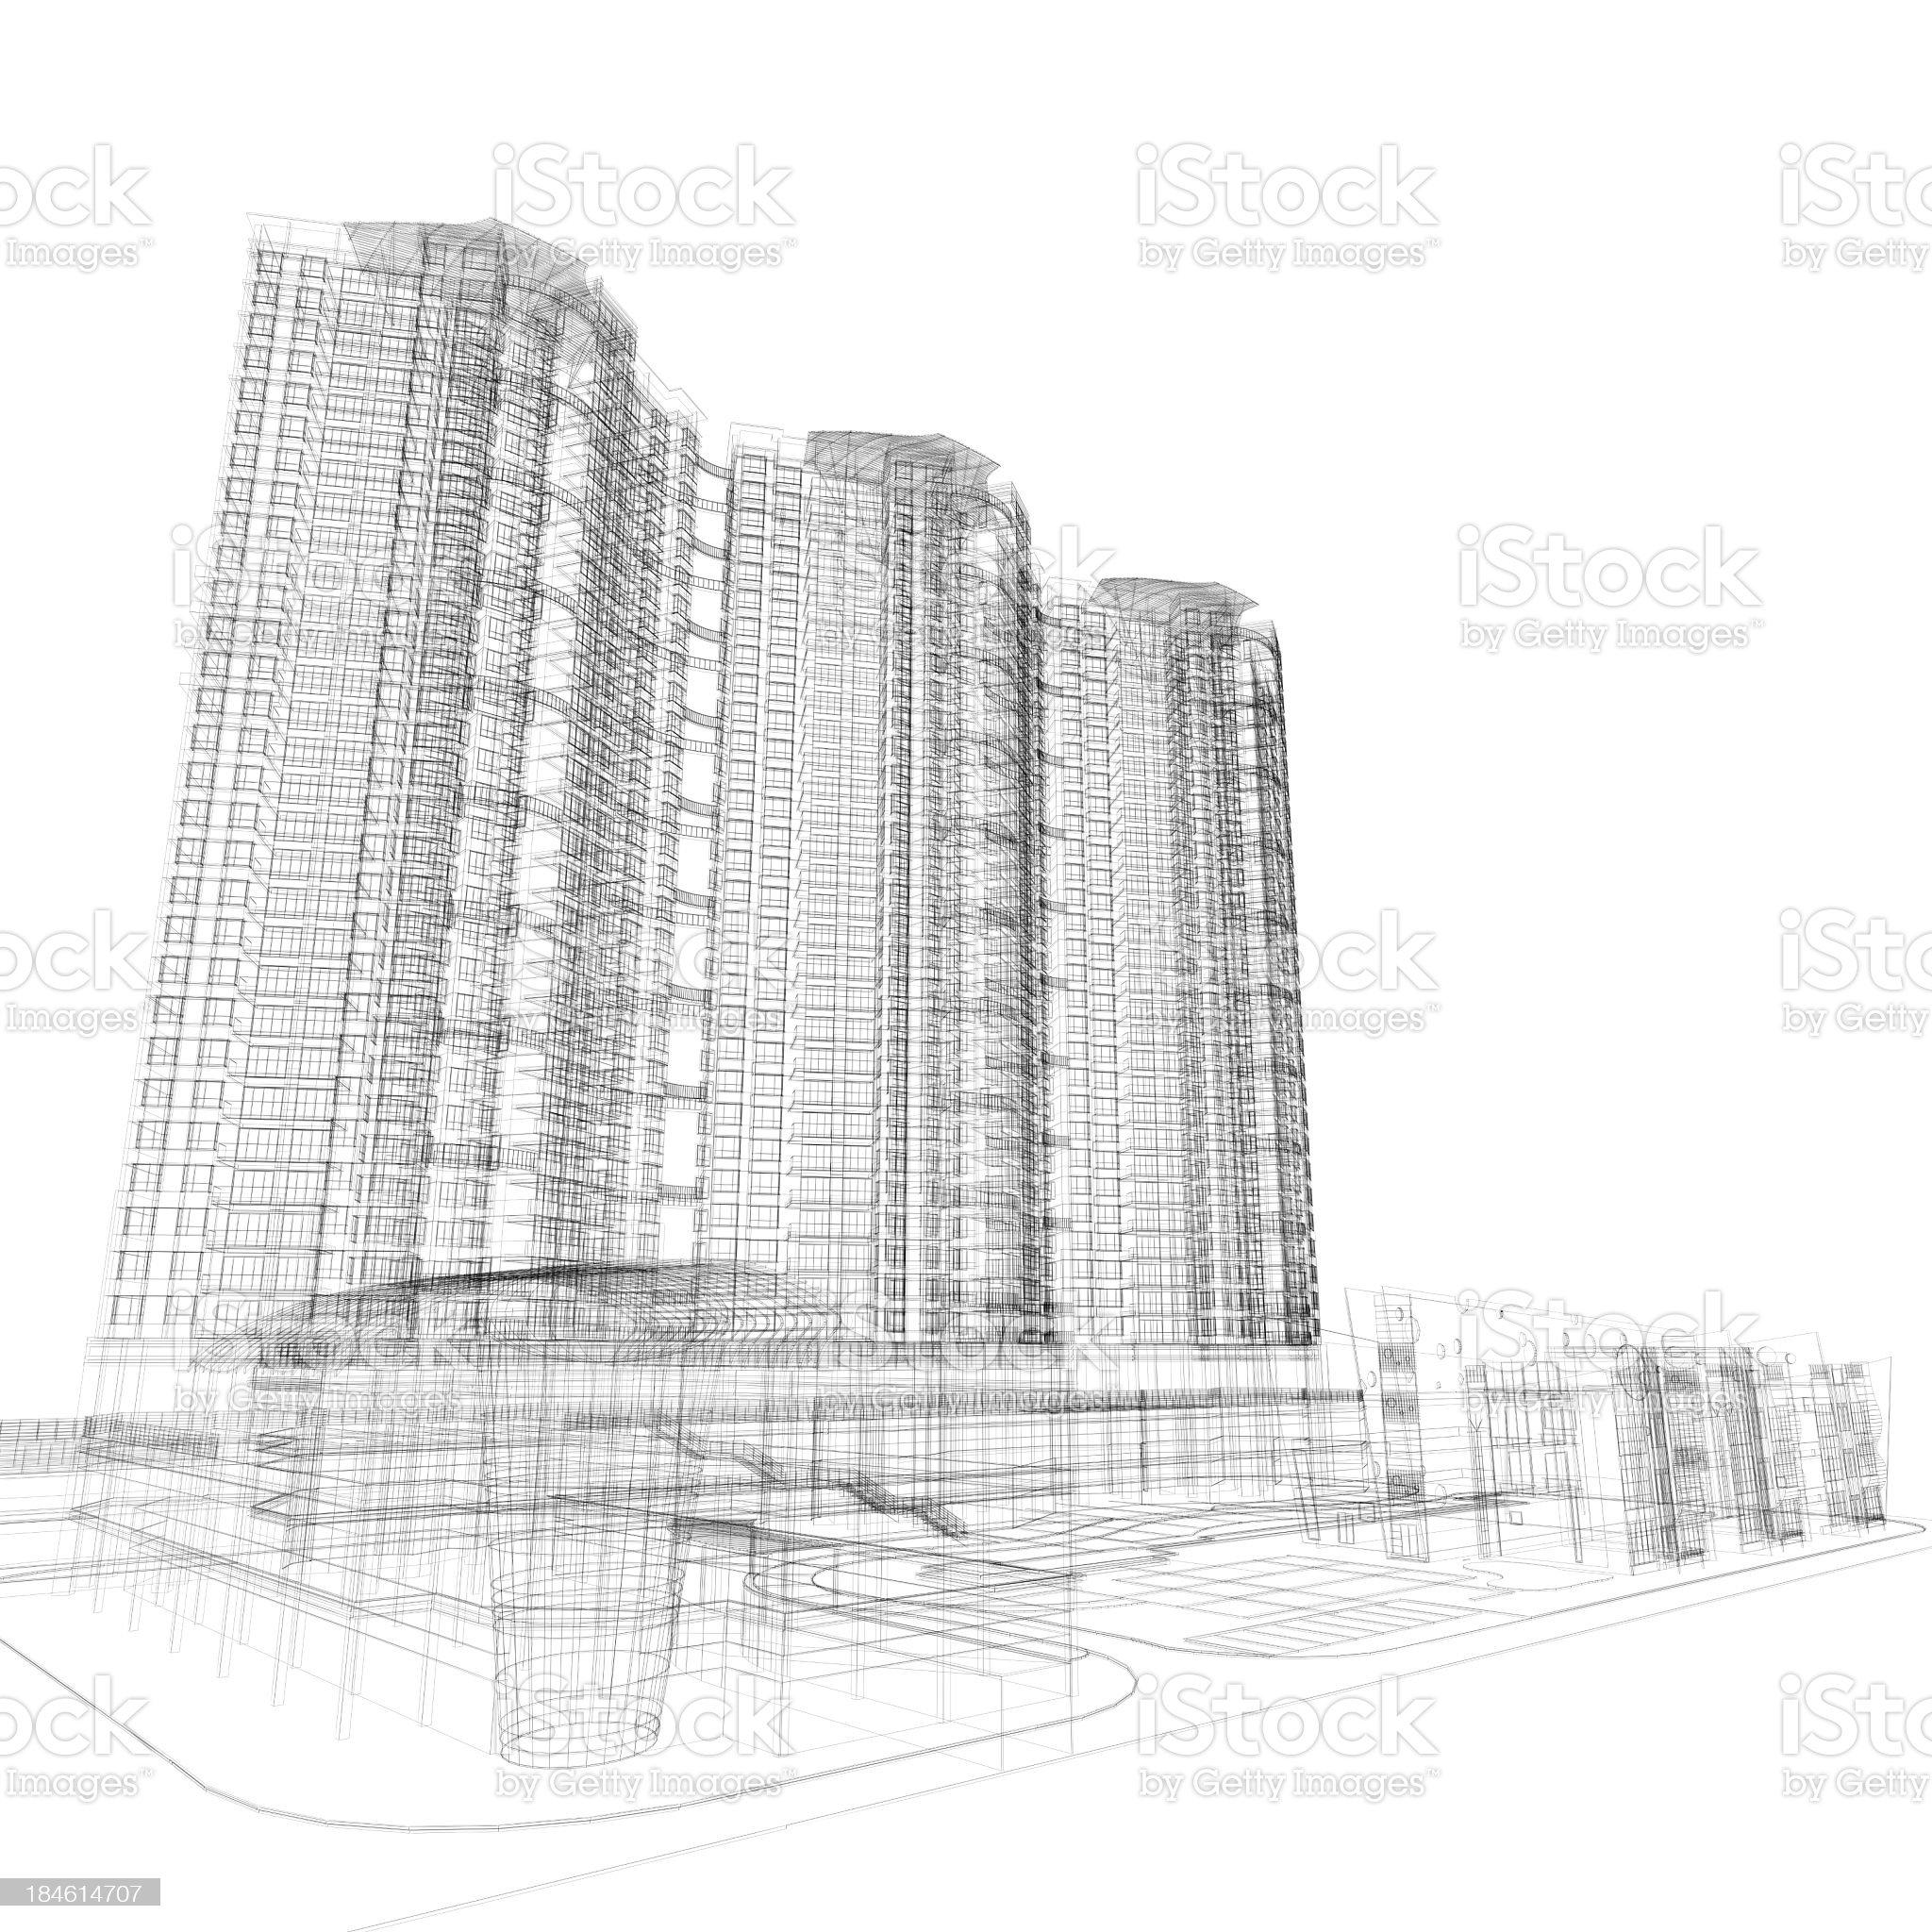 Skyscraper architecture Blueprint royalty-free stock photo